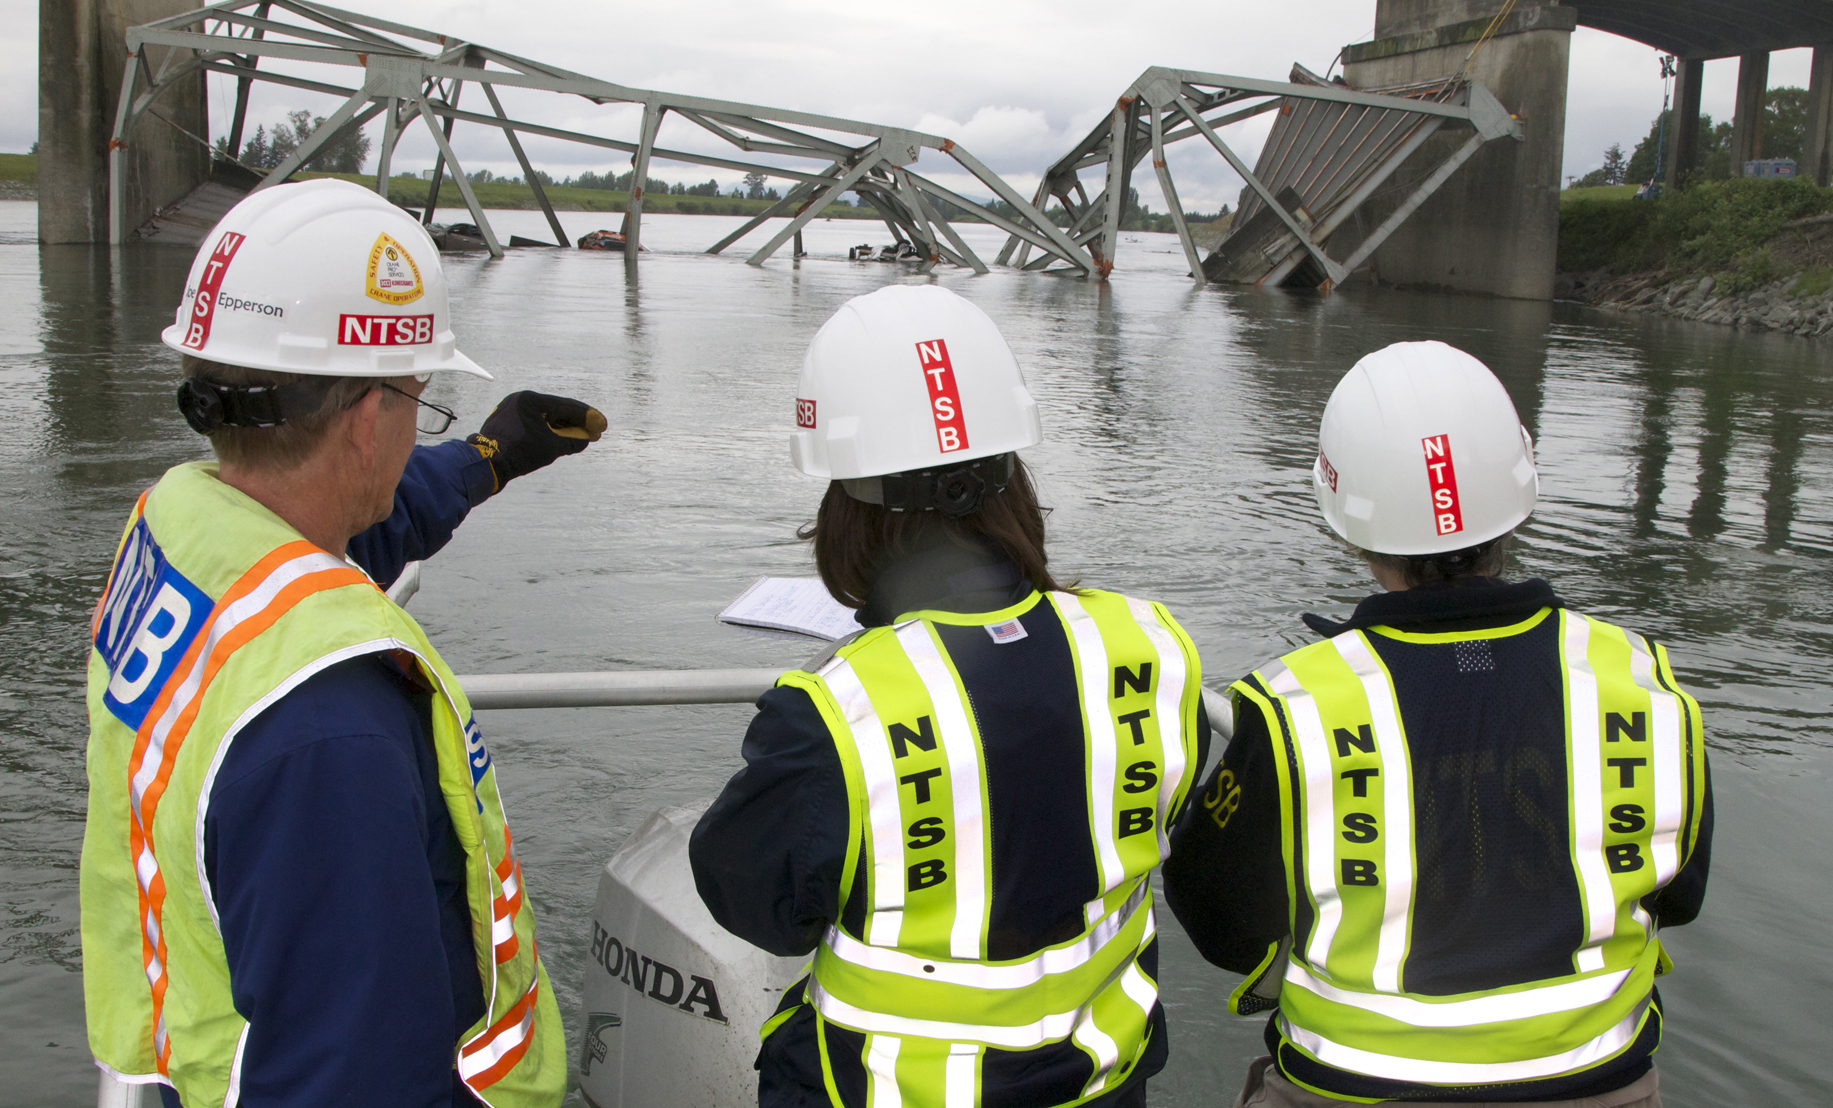 More details in Washington state bridge collapse